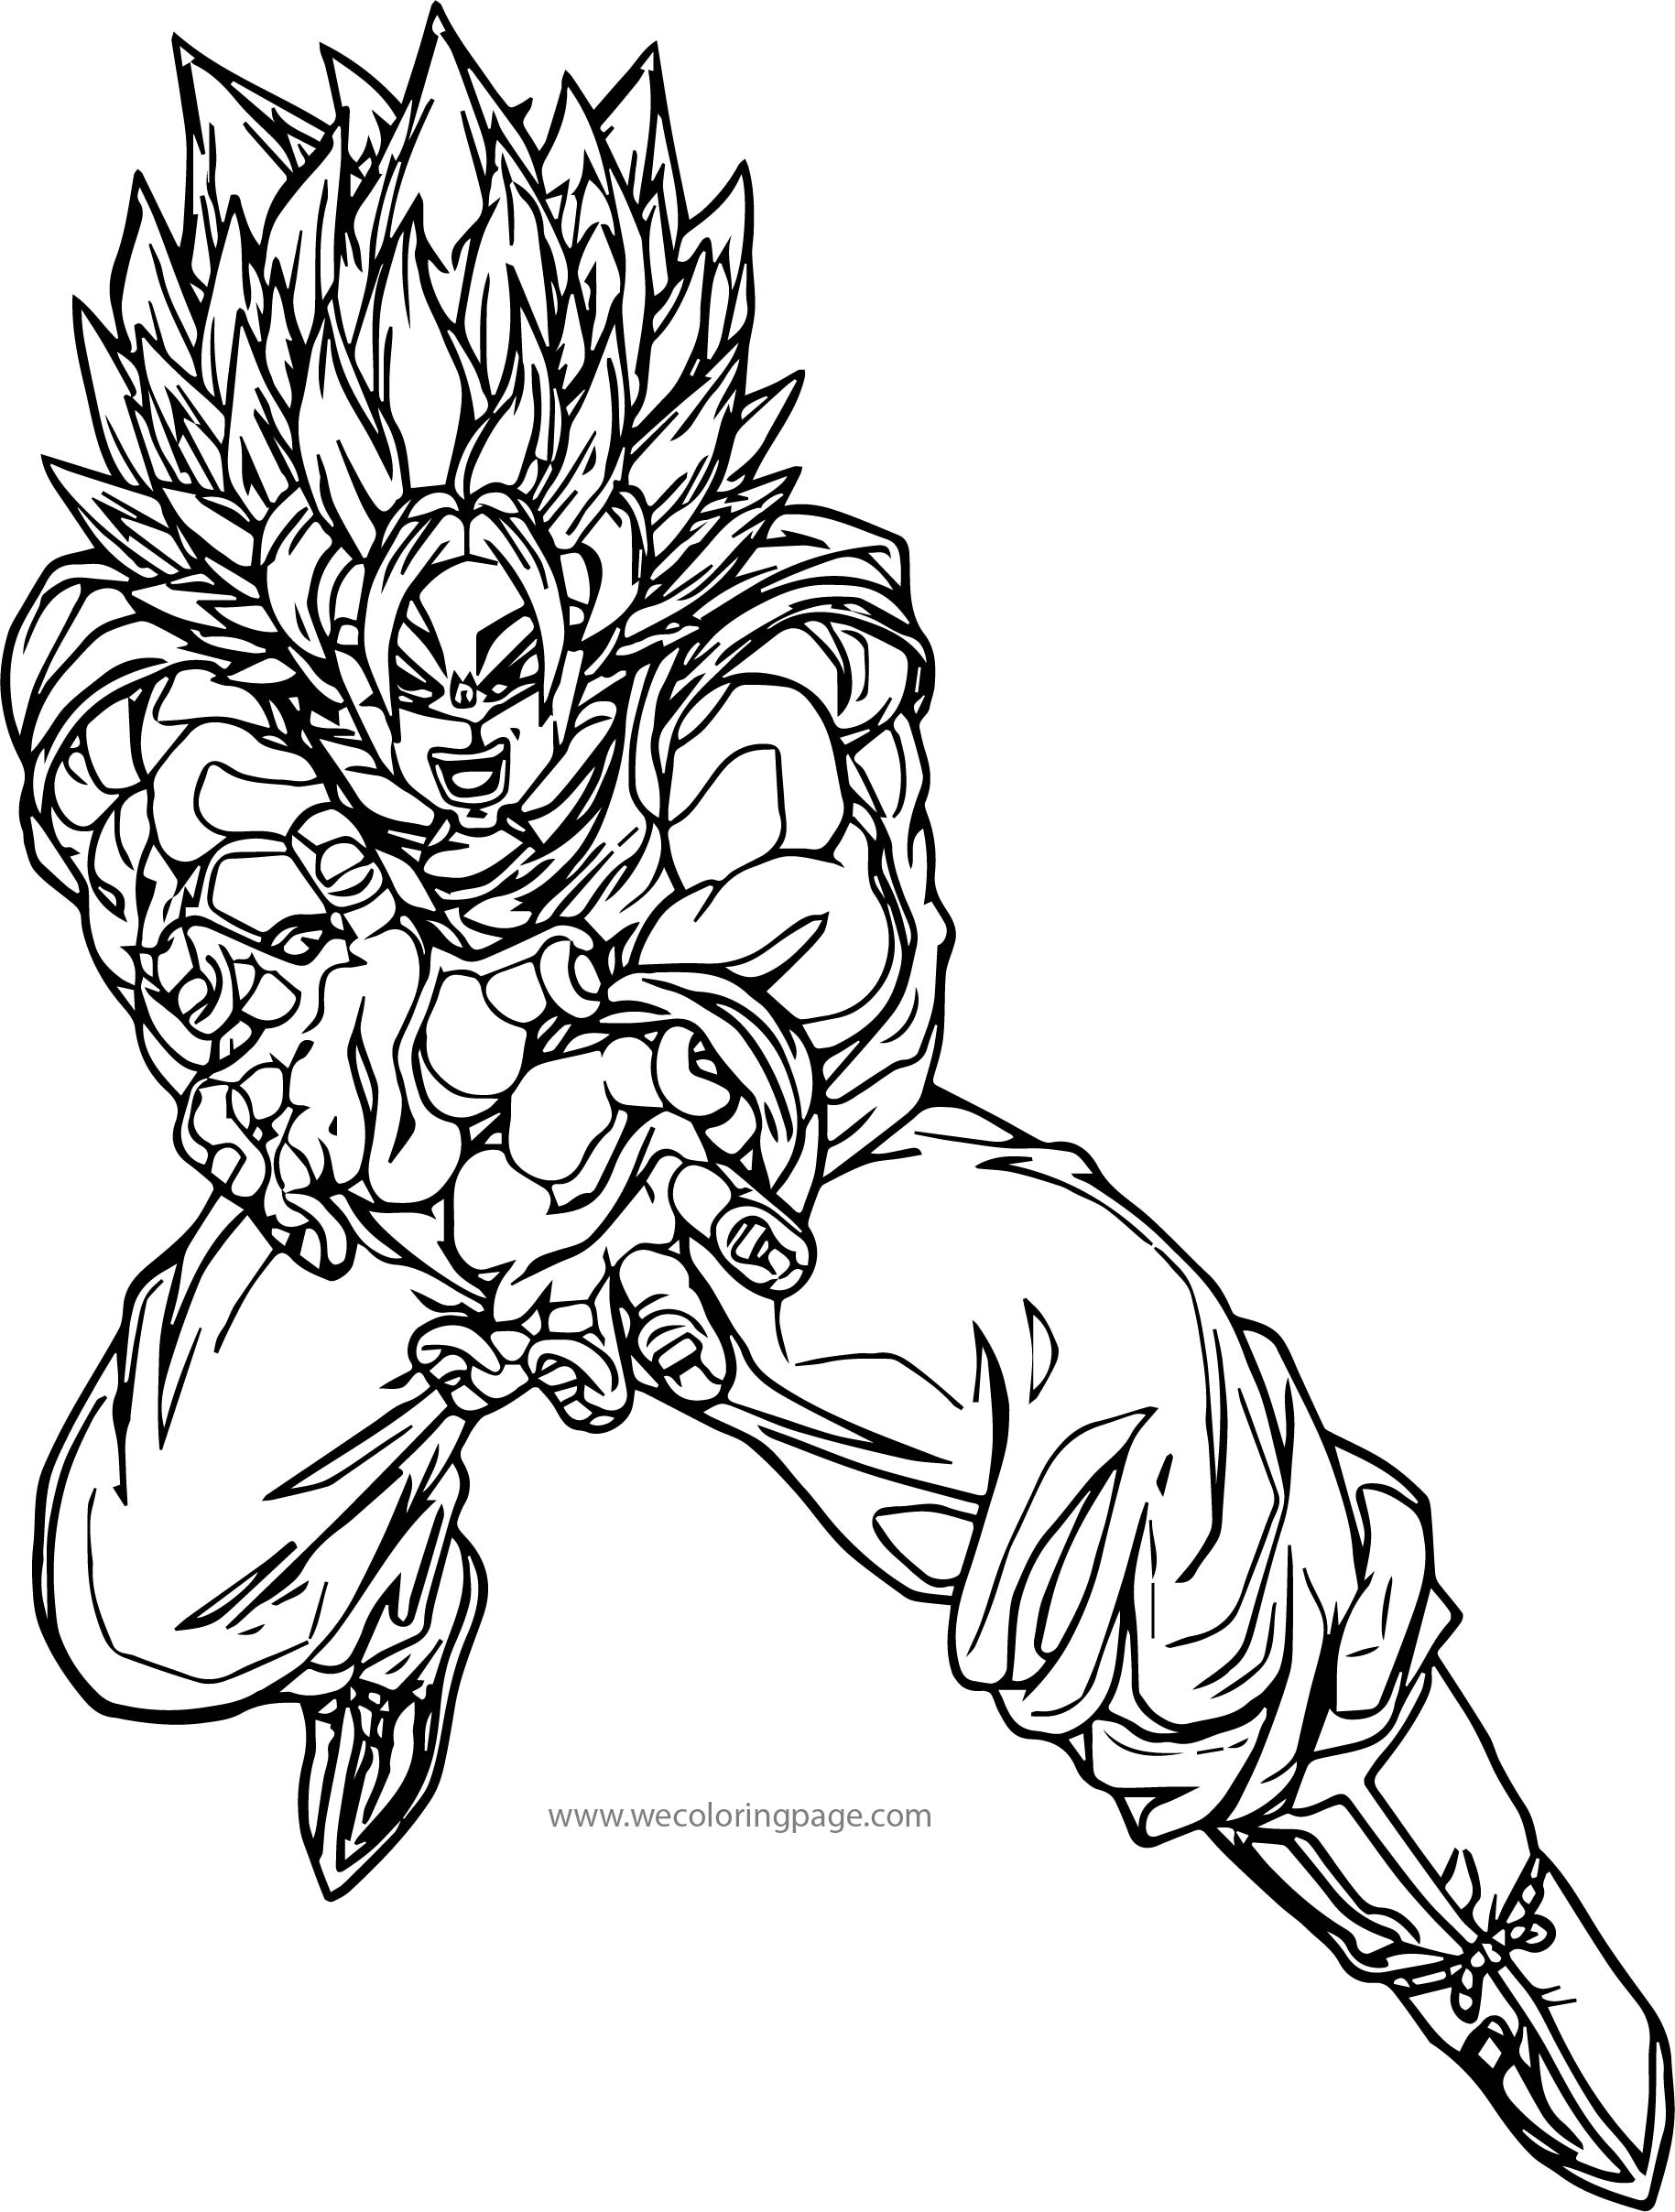 Goku We Coloring Page 462